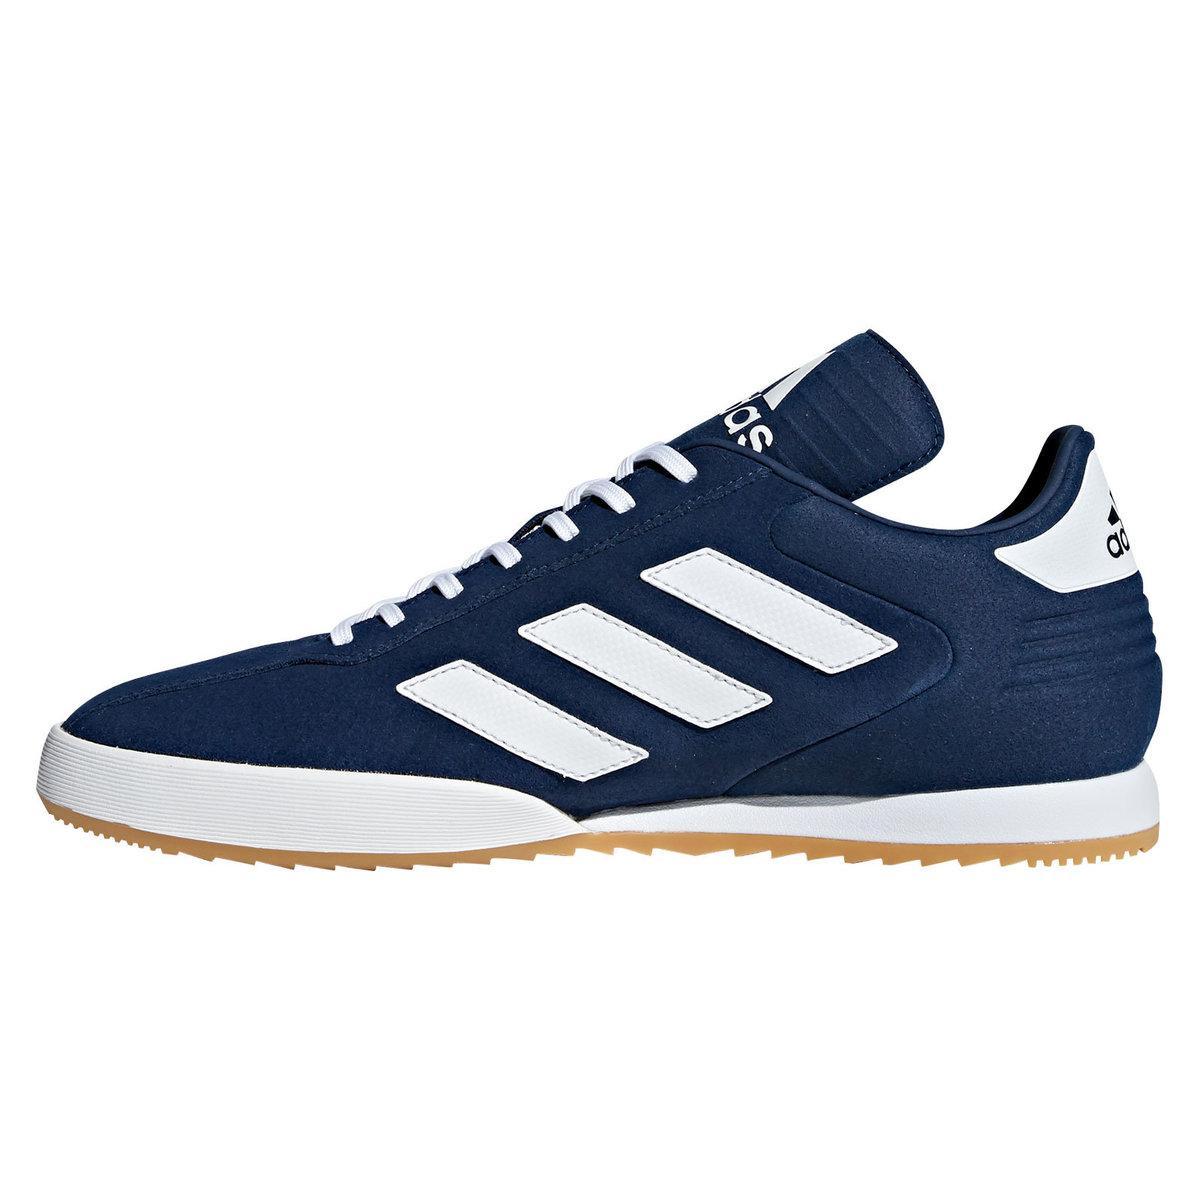 separation shoes a0647 cf584 ... Adidas - Blue Copa Super Shoes for Men - Lyst. View fullscreen  4c21a6bdbc7 ...